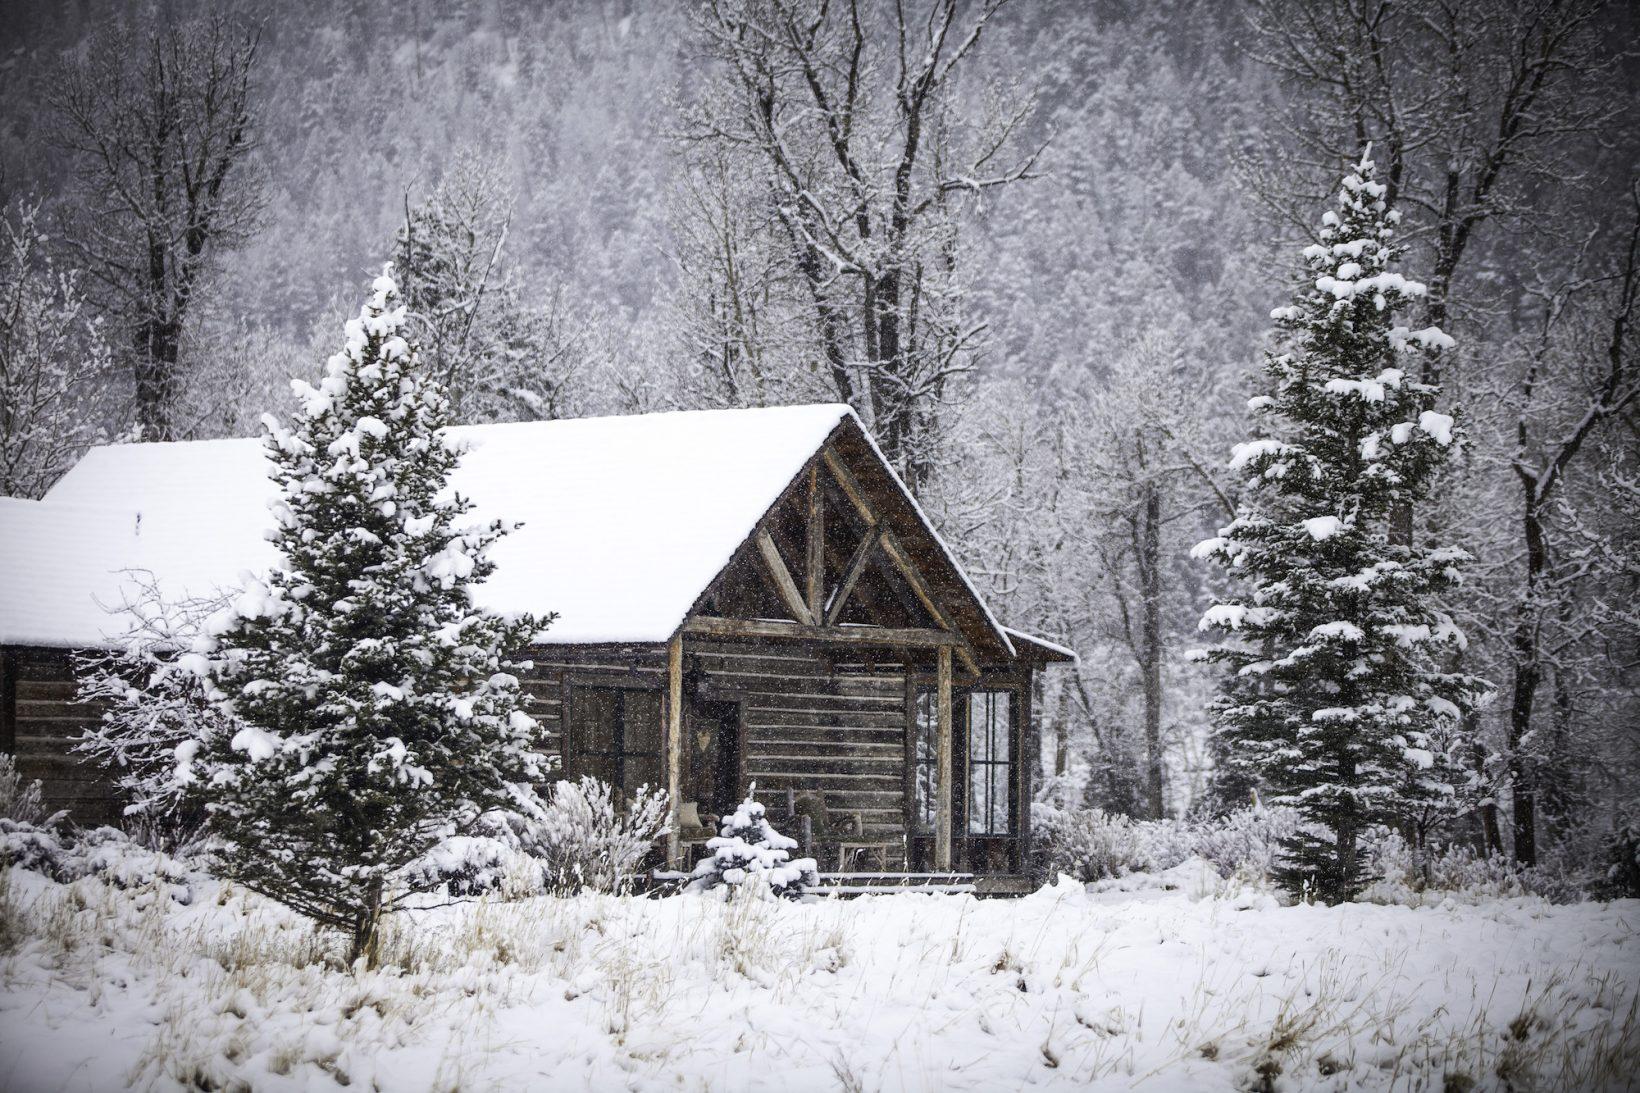 Bluebird Cabin, a favorite honeymoon or anniversary abode, sits under a blanket of fresh snow